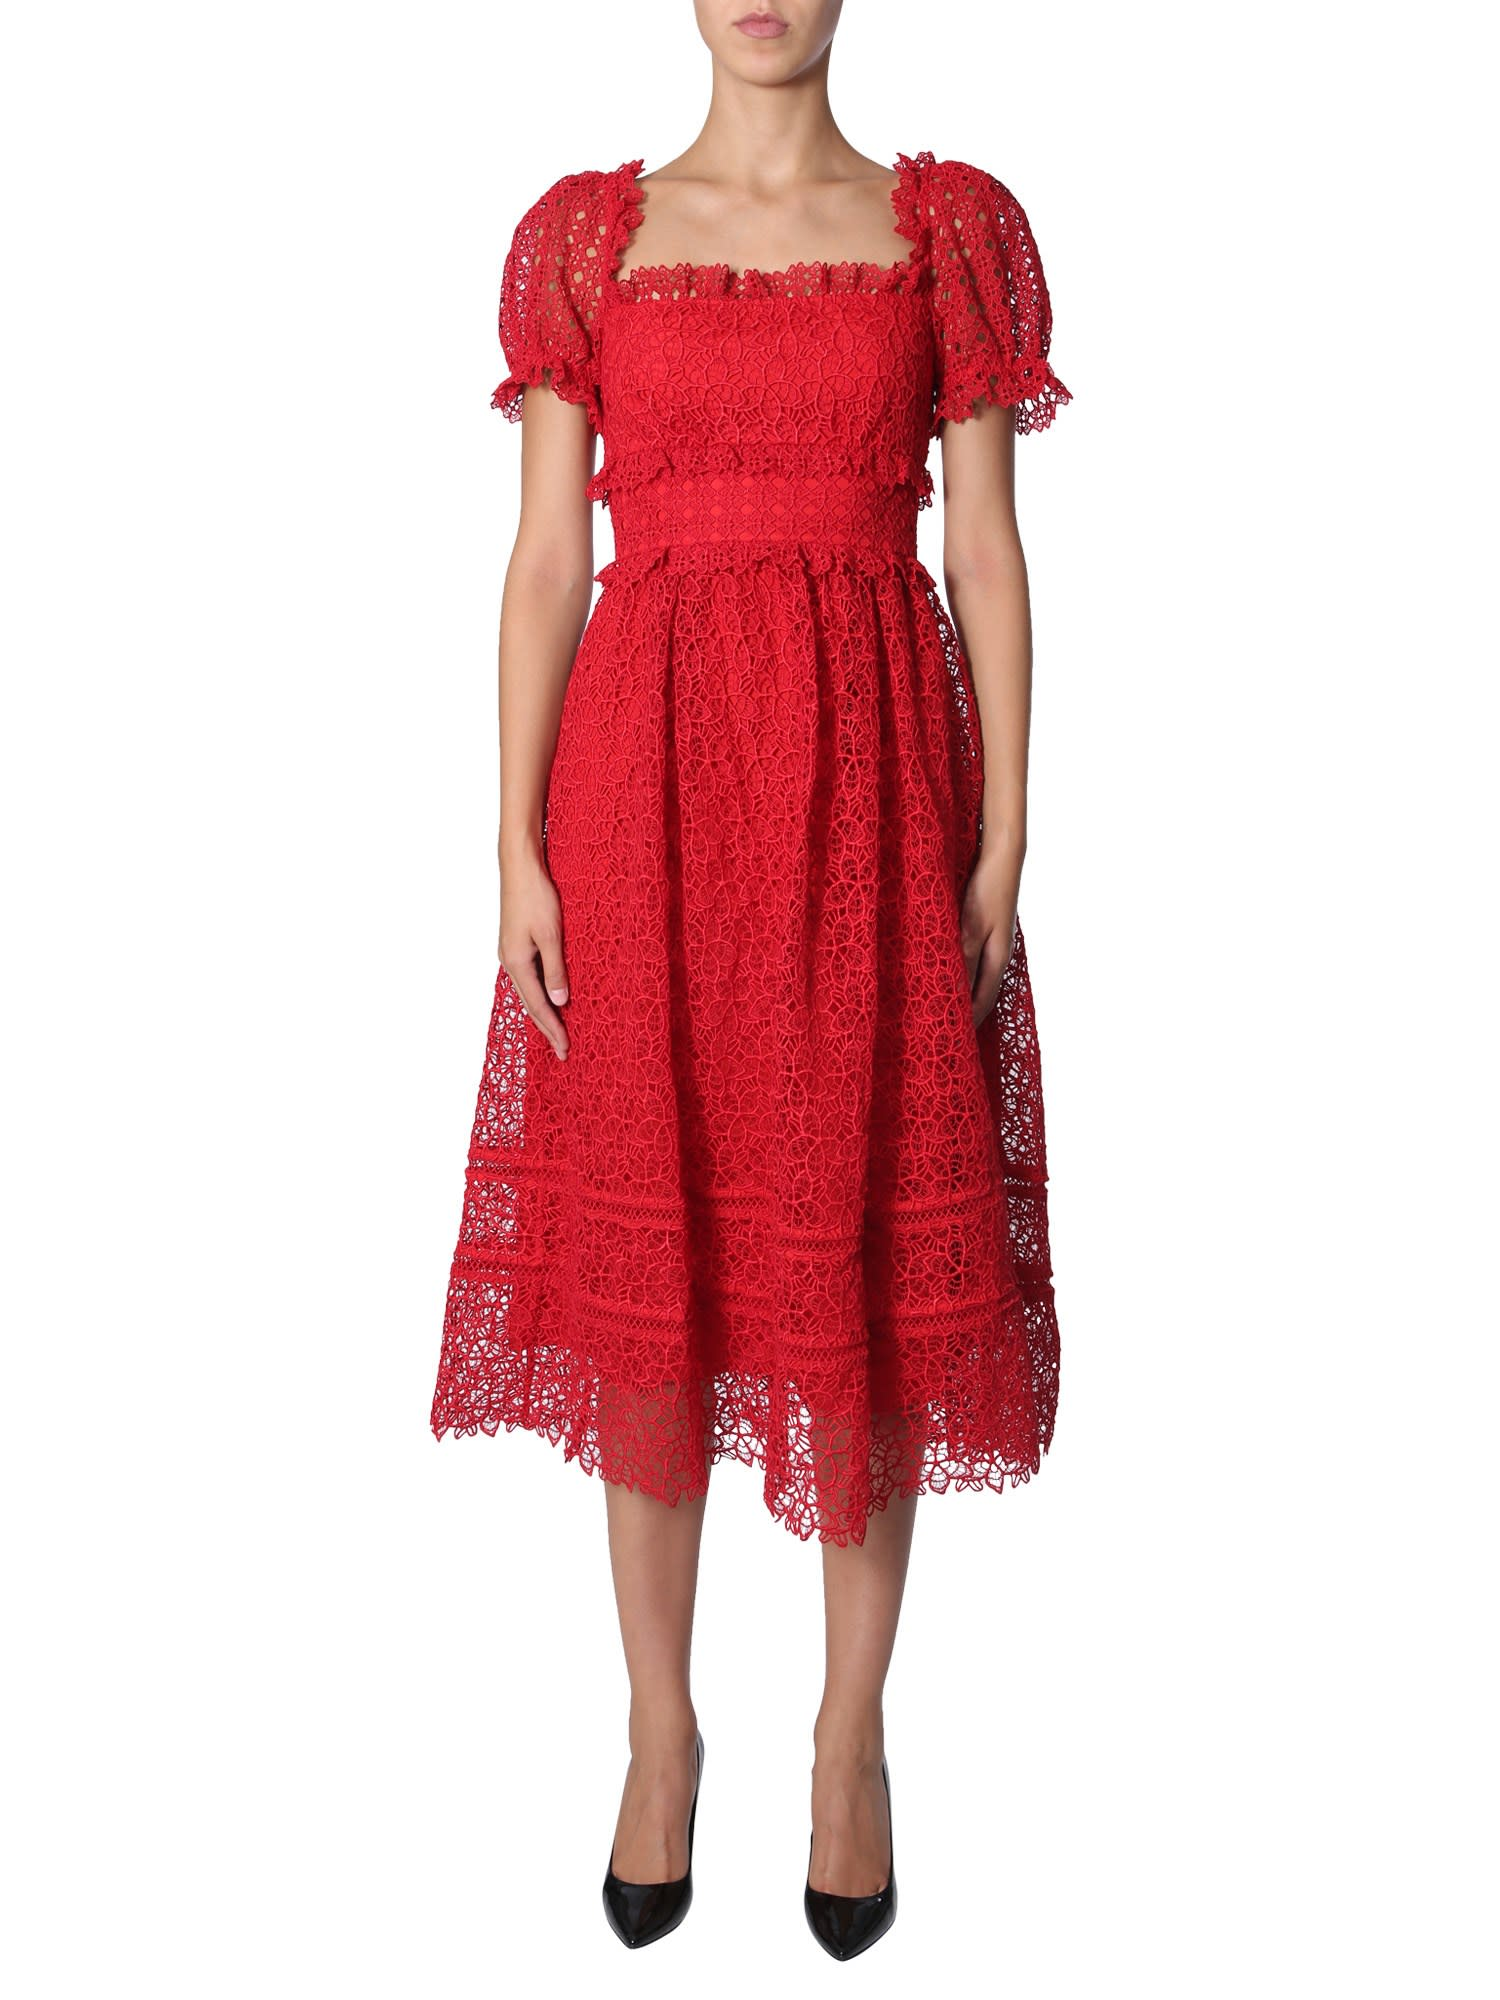 self-portrait Hibiscus Guipure Dress